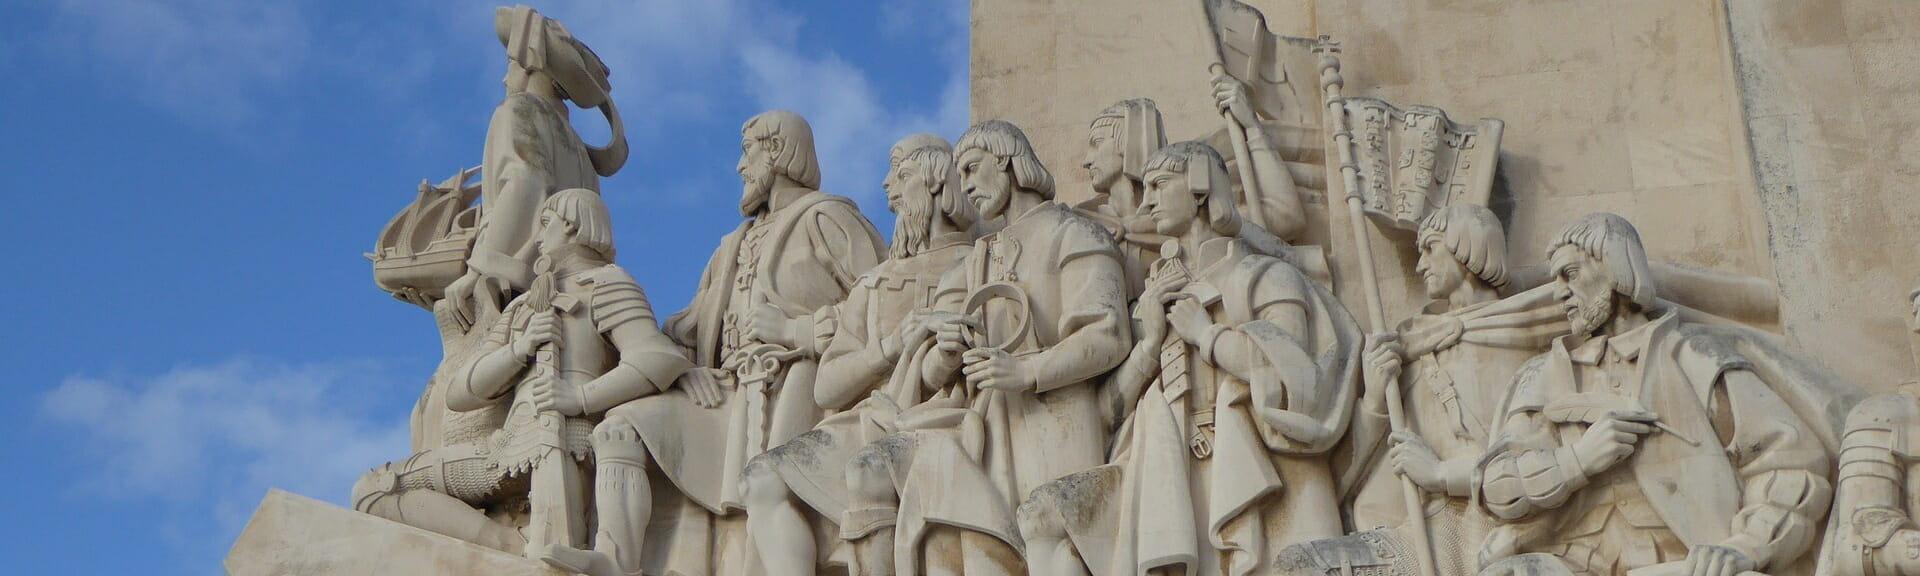 Klassenfahrt Lissabon Entdeckerdenkmal Padrao dos Descobrimentos